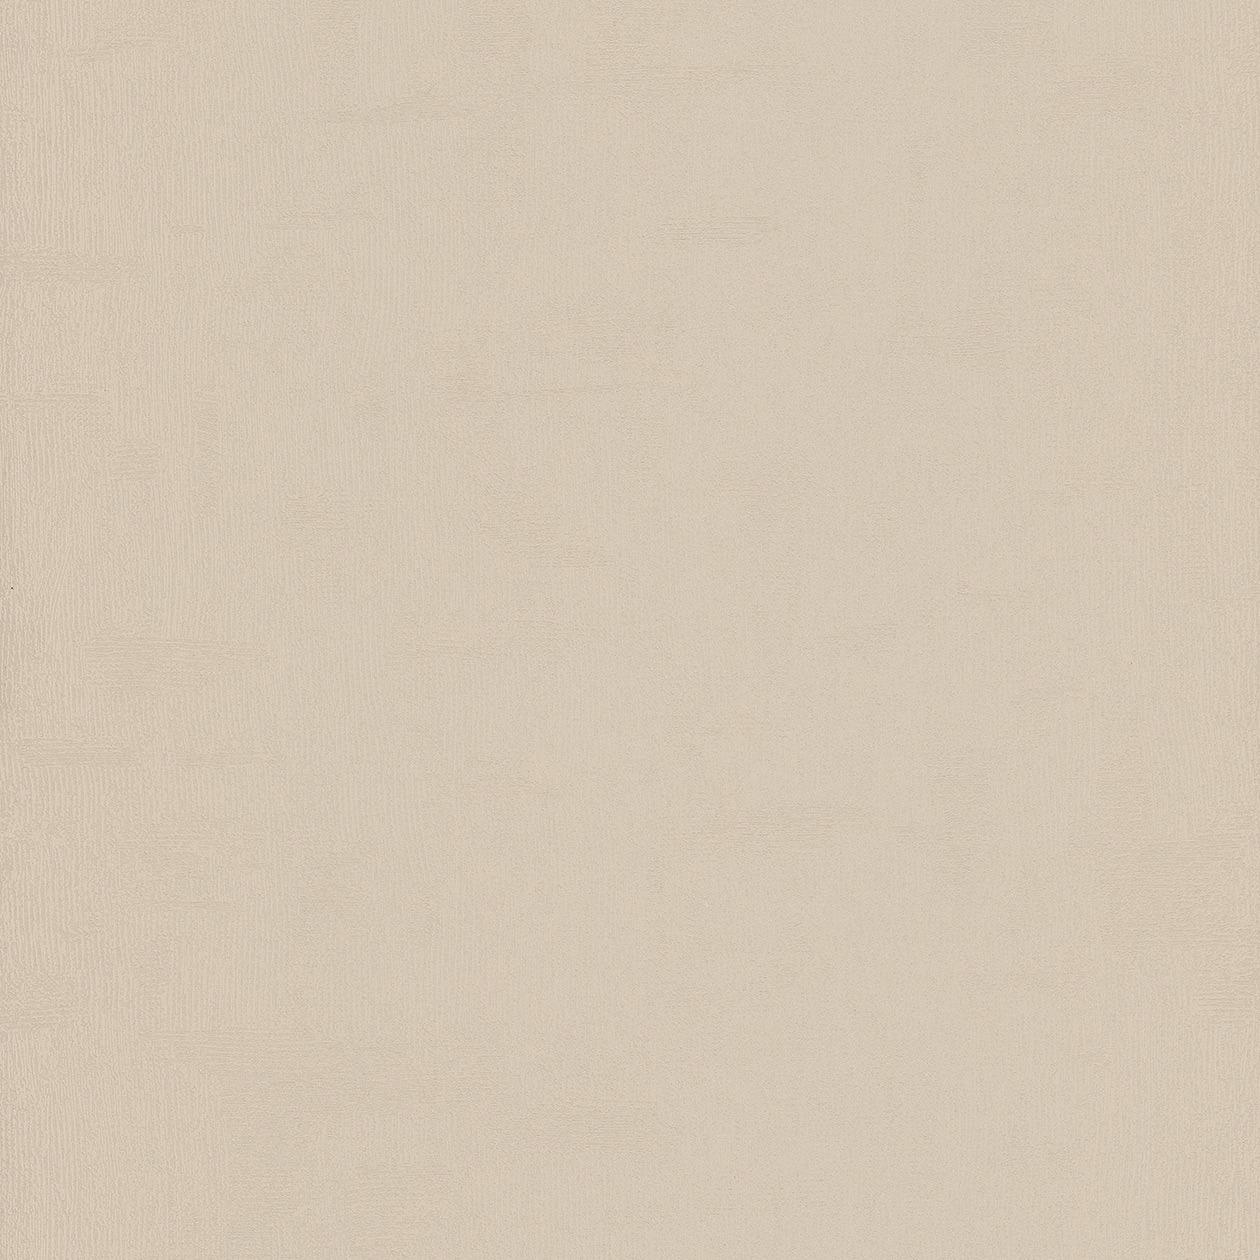 Французские обои Caselio,  коллекция Trio, артикулTIO67981010